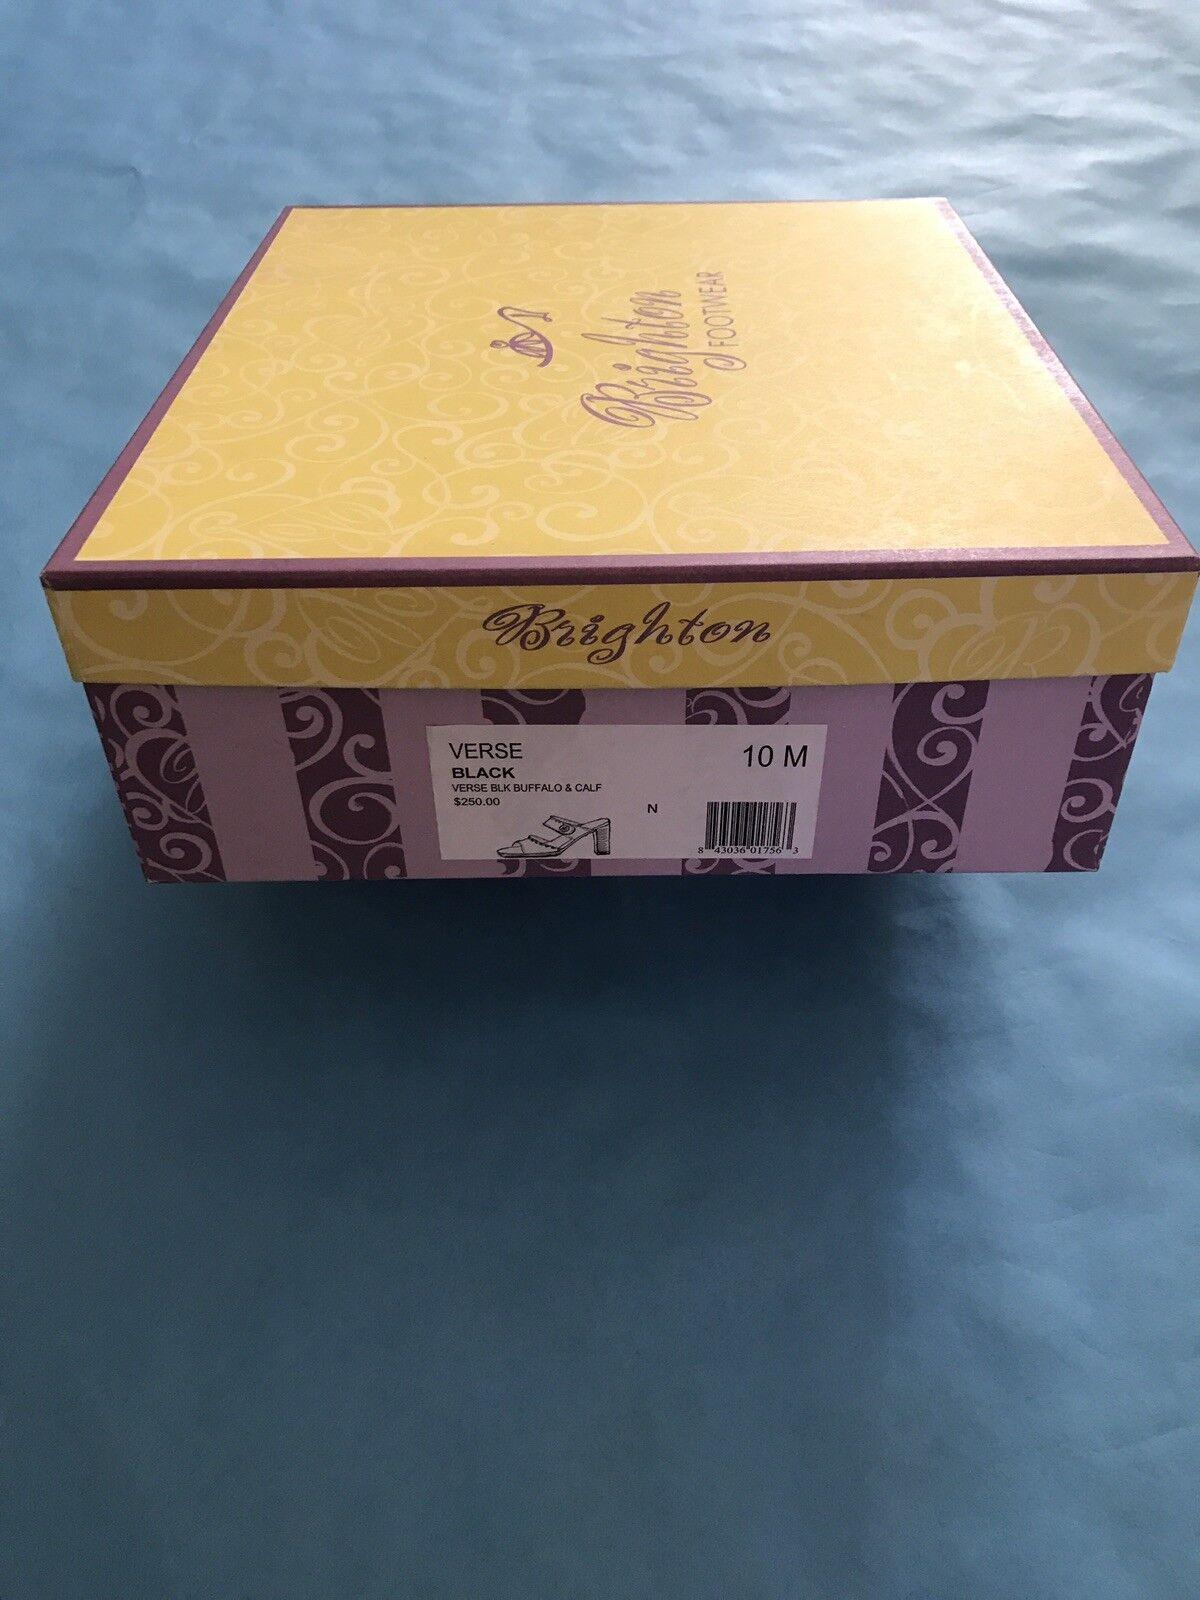 Brighton chaussures New Style  Verse BLK Buffalo & Calf Calf Calf Taille  10 M 364e61